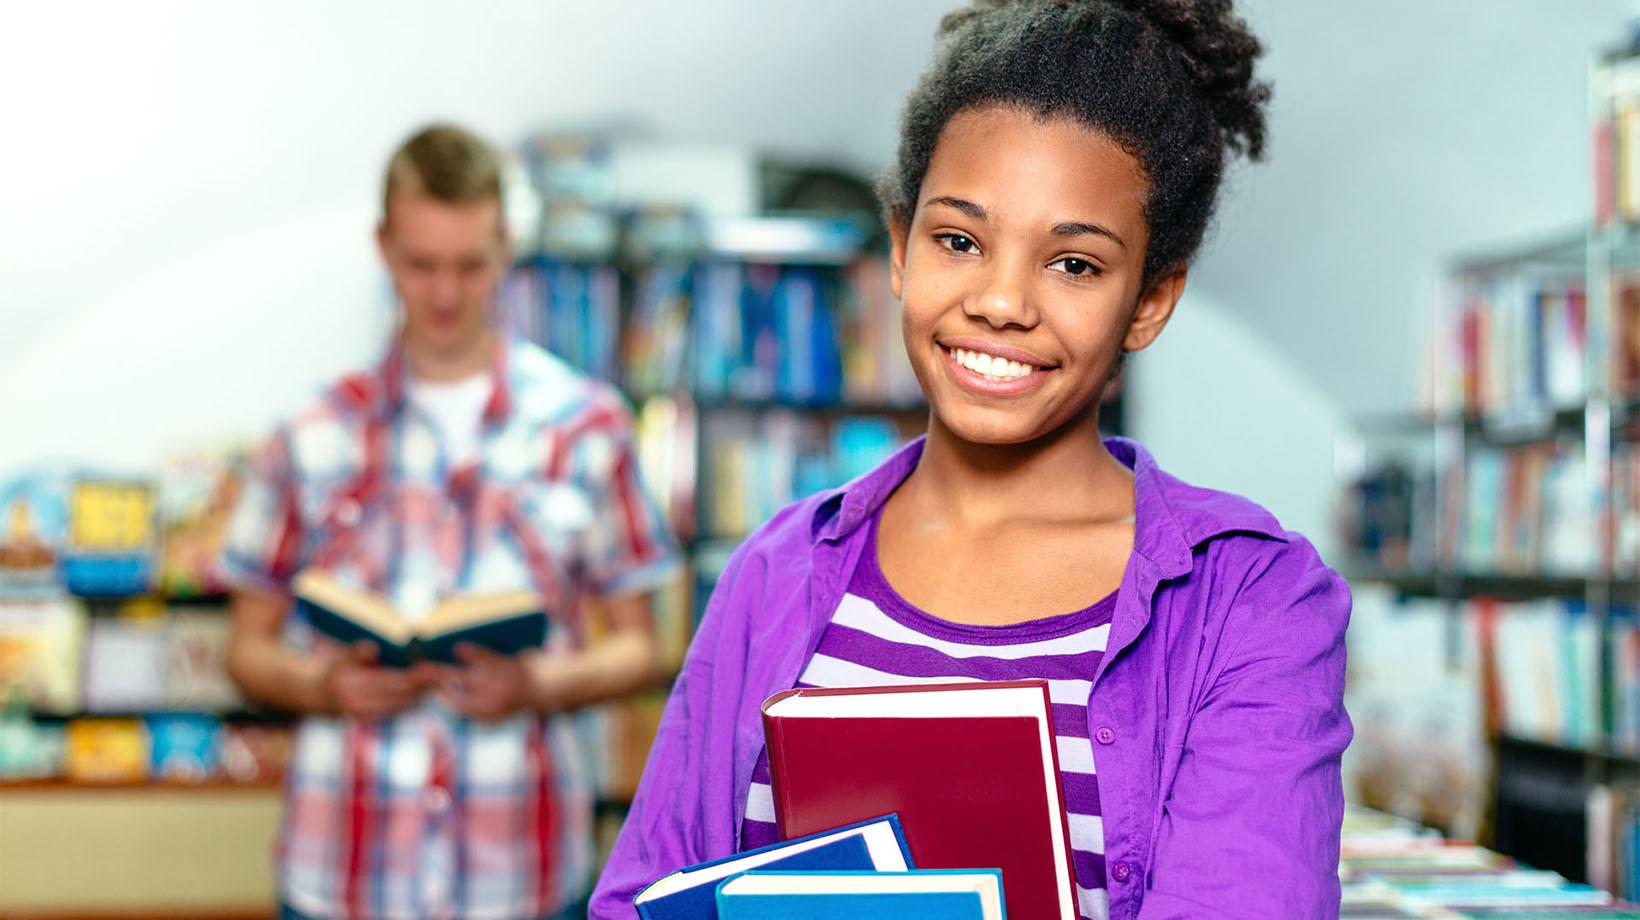 Rapid Skin Repair: Get Your Skin Looking Good for Back to School